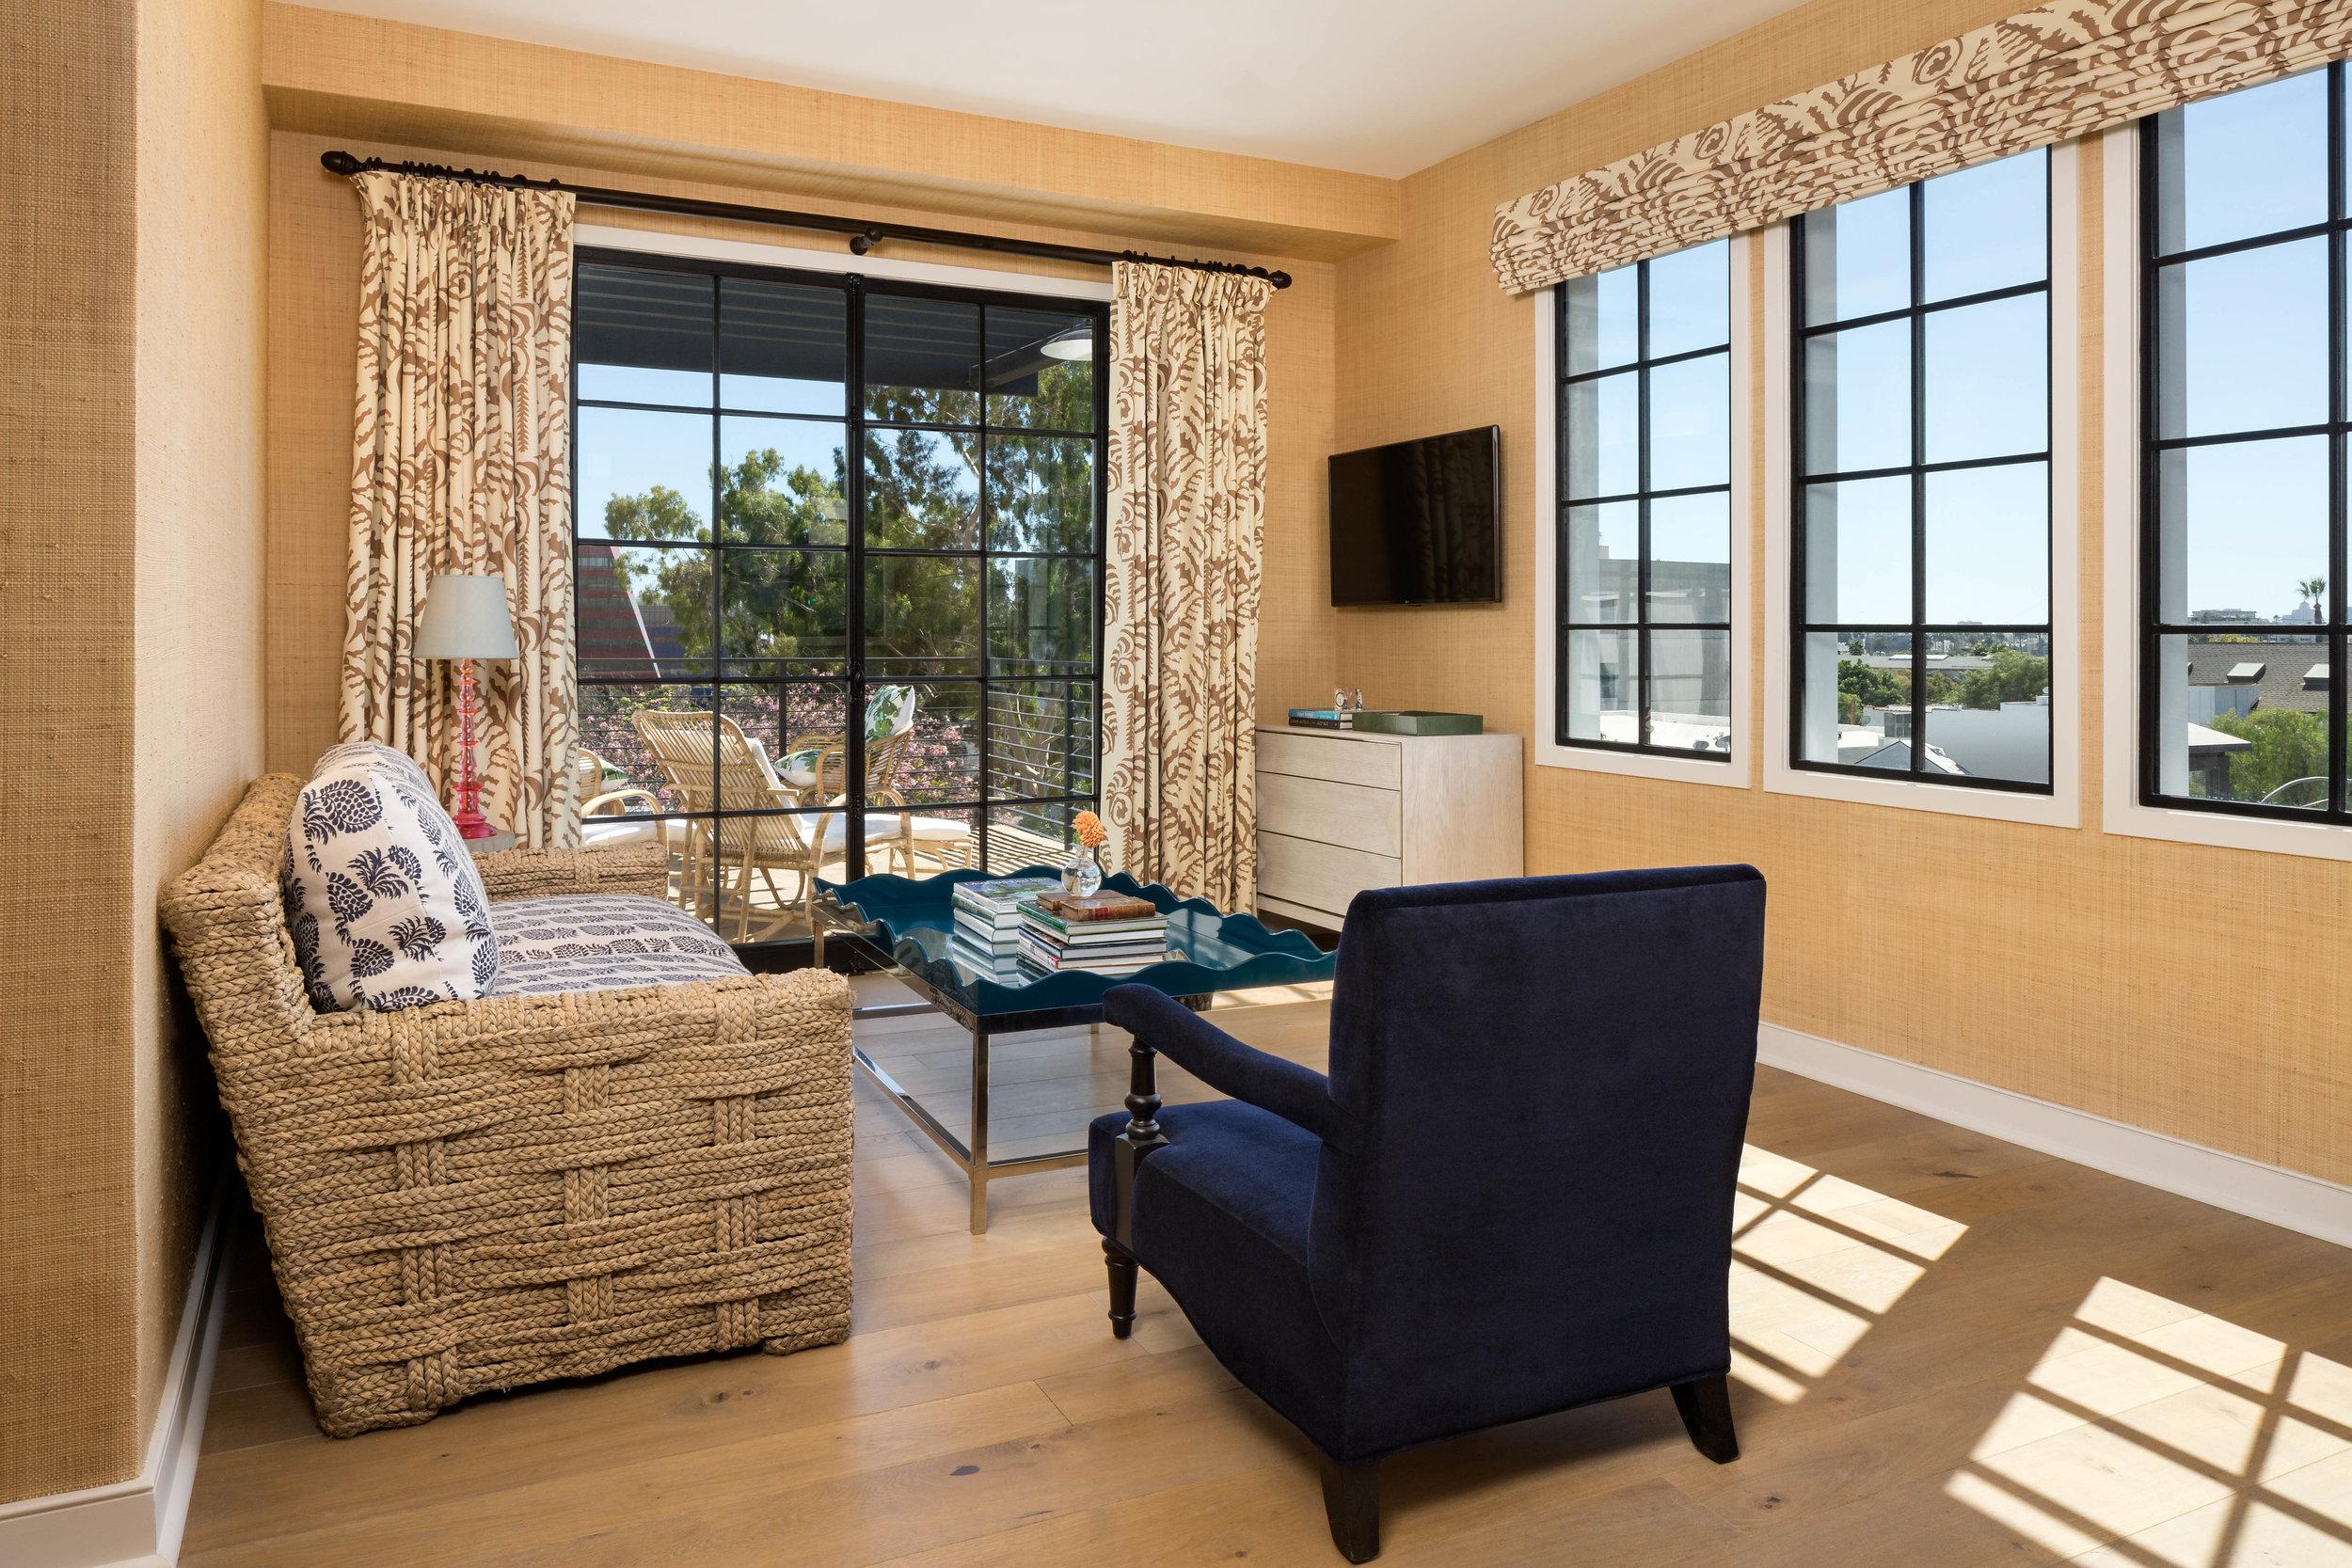 PIXELLAB_850 HOTEL-2066PXLB2066.jpg